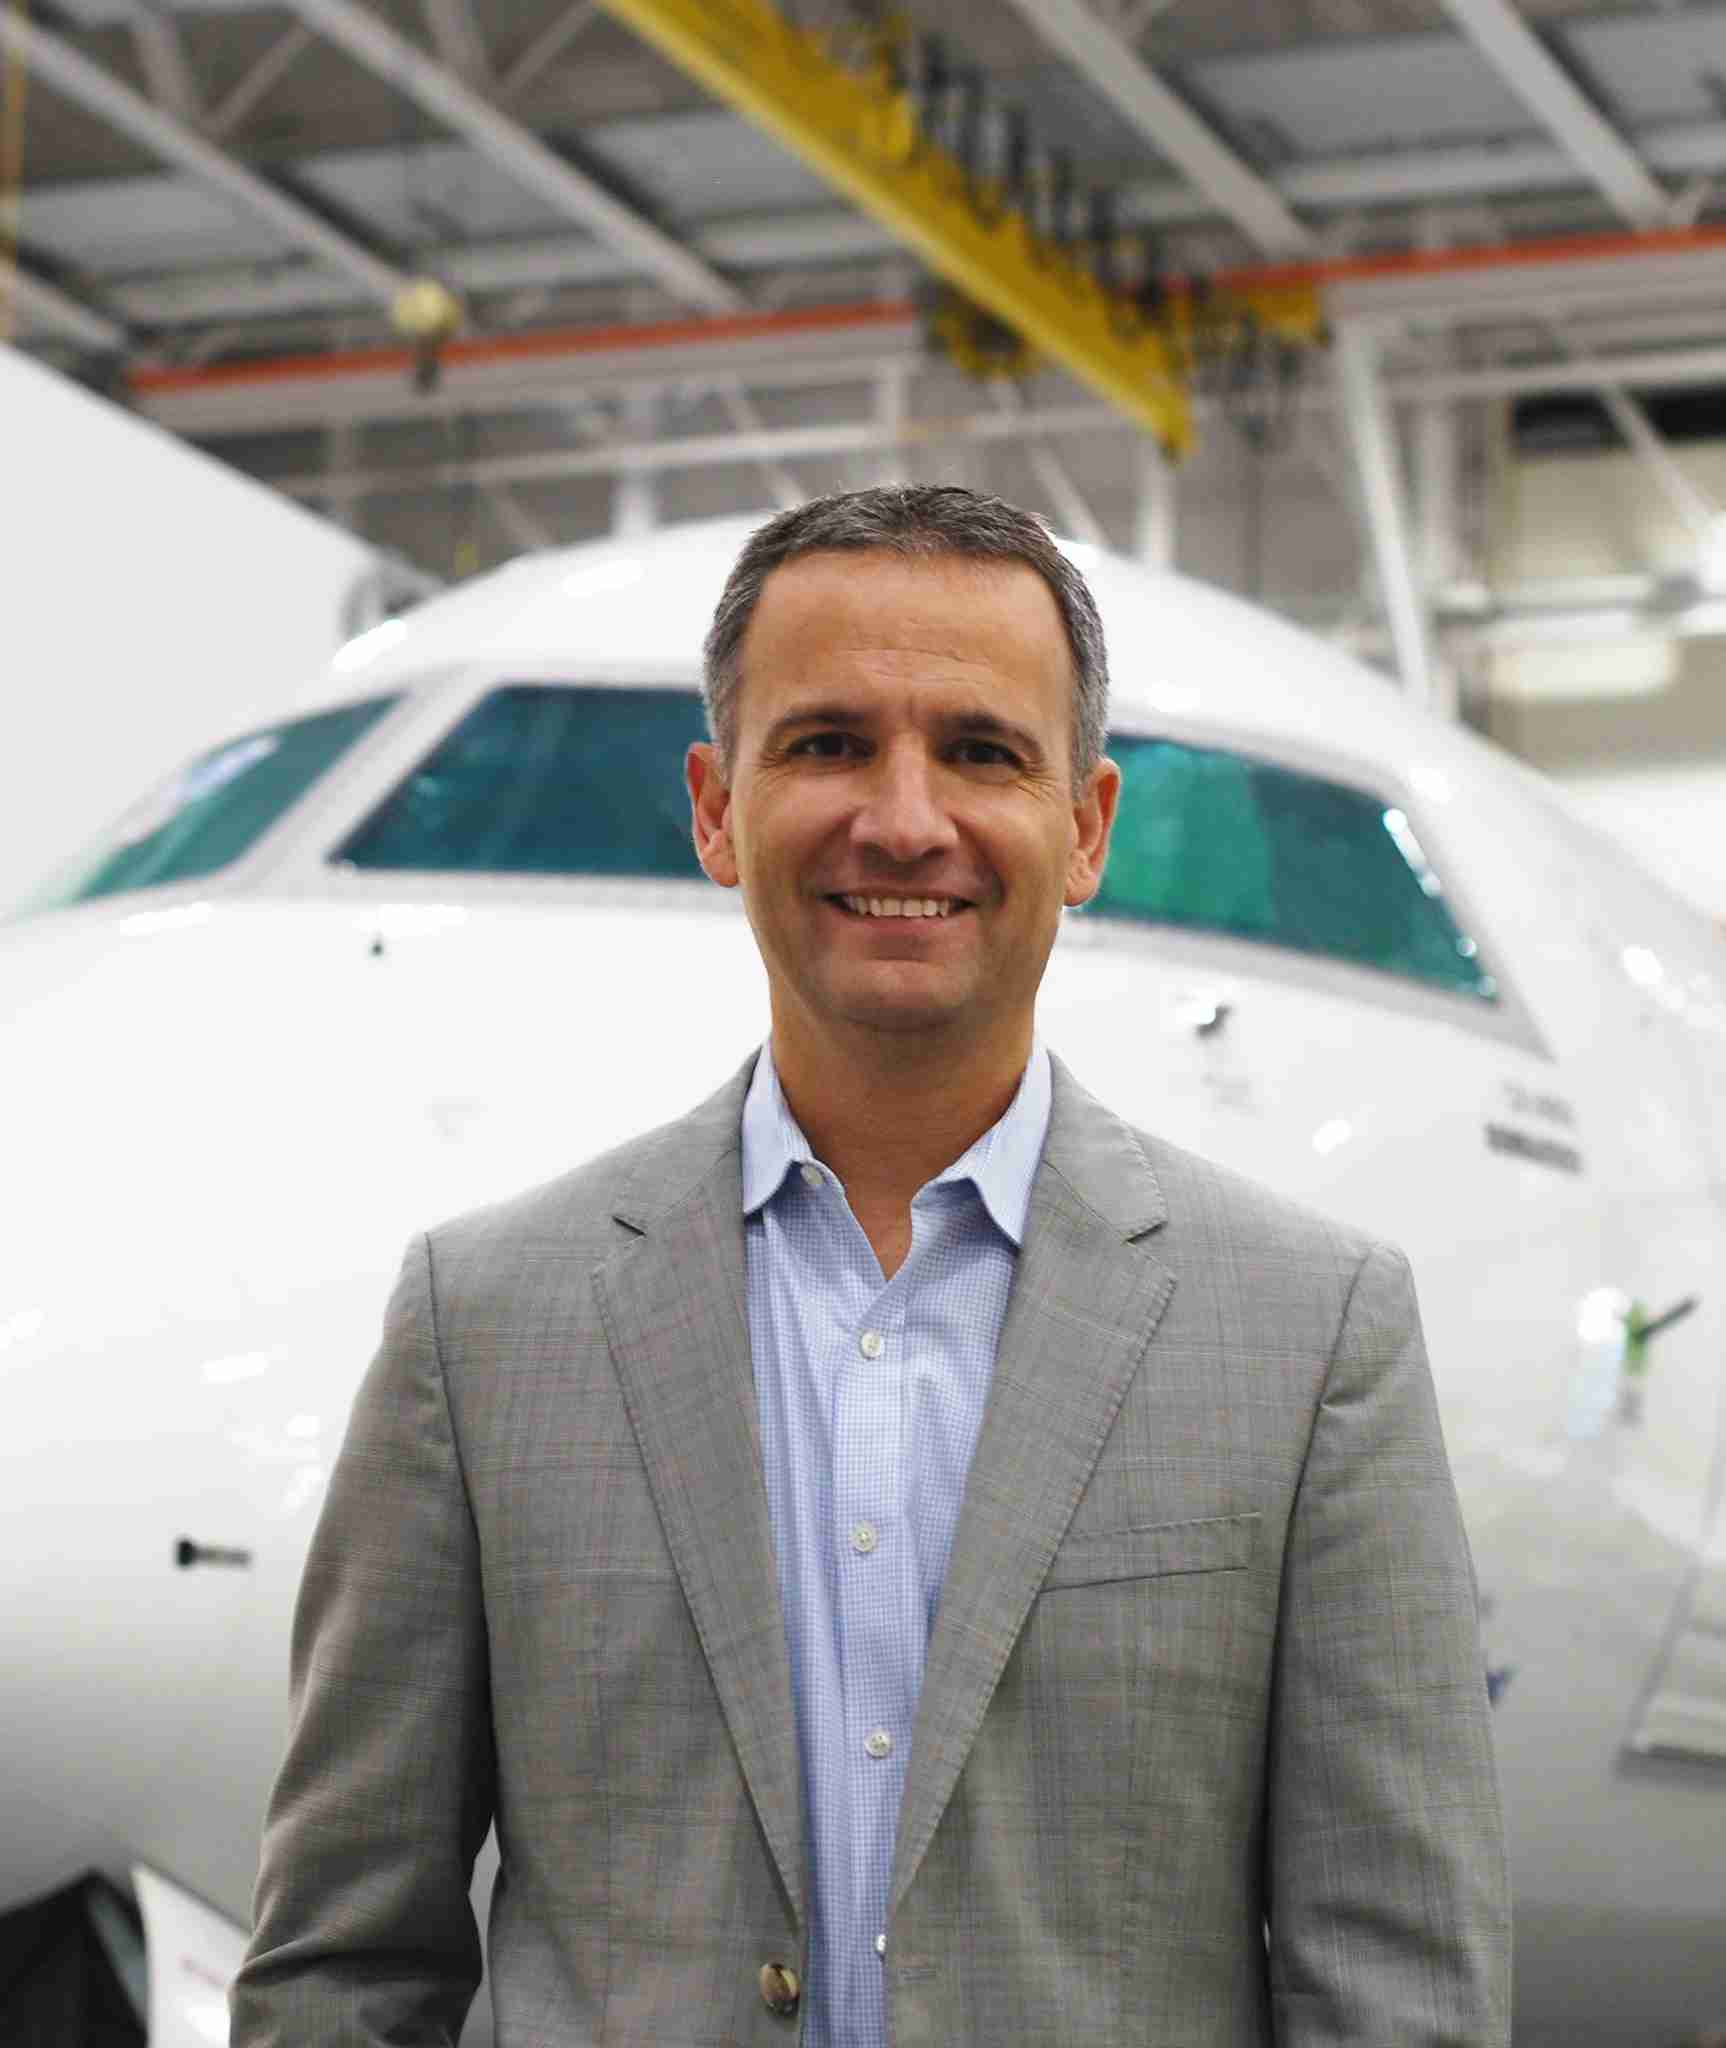 Bombardier Commercial Aircraft VP of Marketing, Patrick Baudis (Photo by Howard Slutsken / TPG)